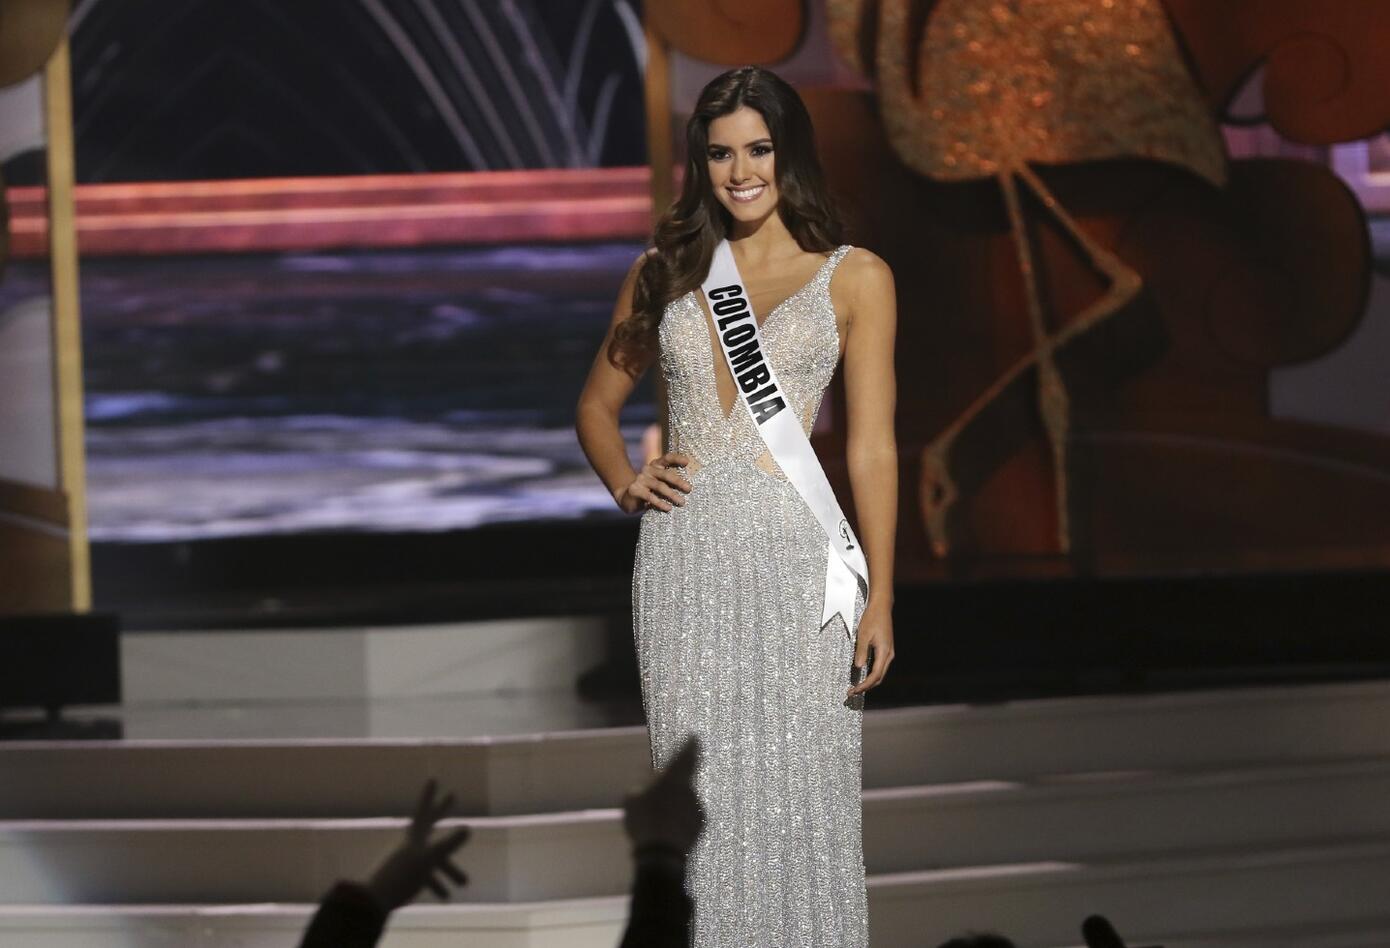 Paulina Vega desfila su traje de gala en Miss Universo en 2015